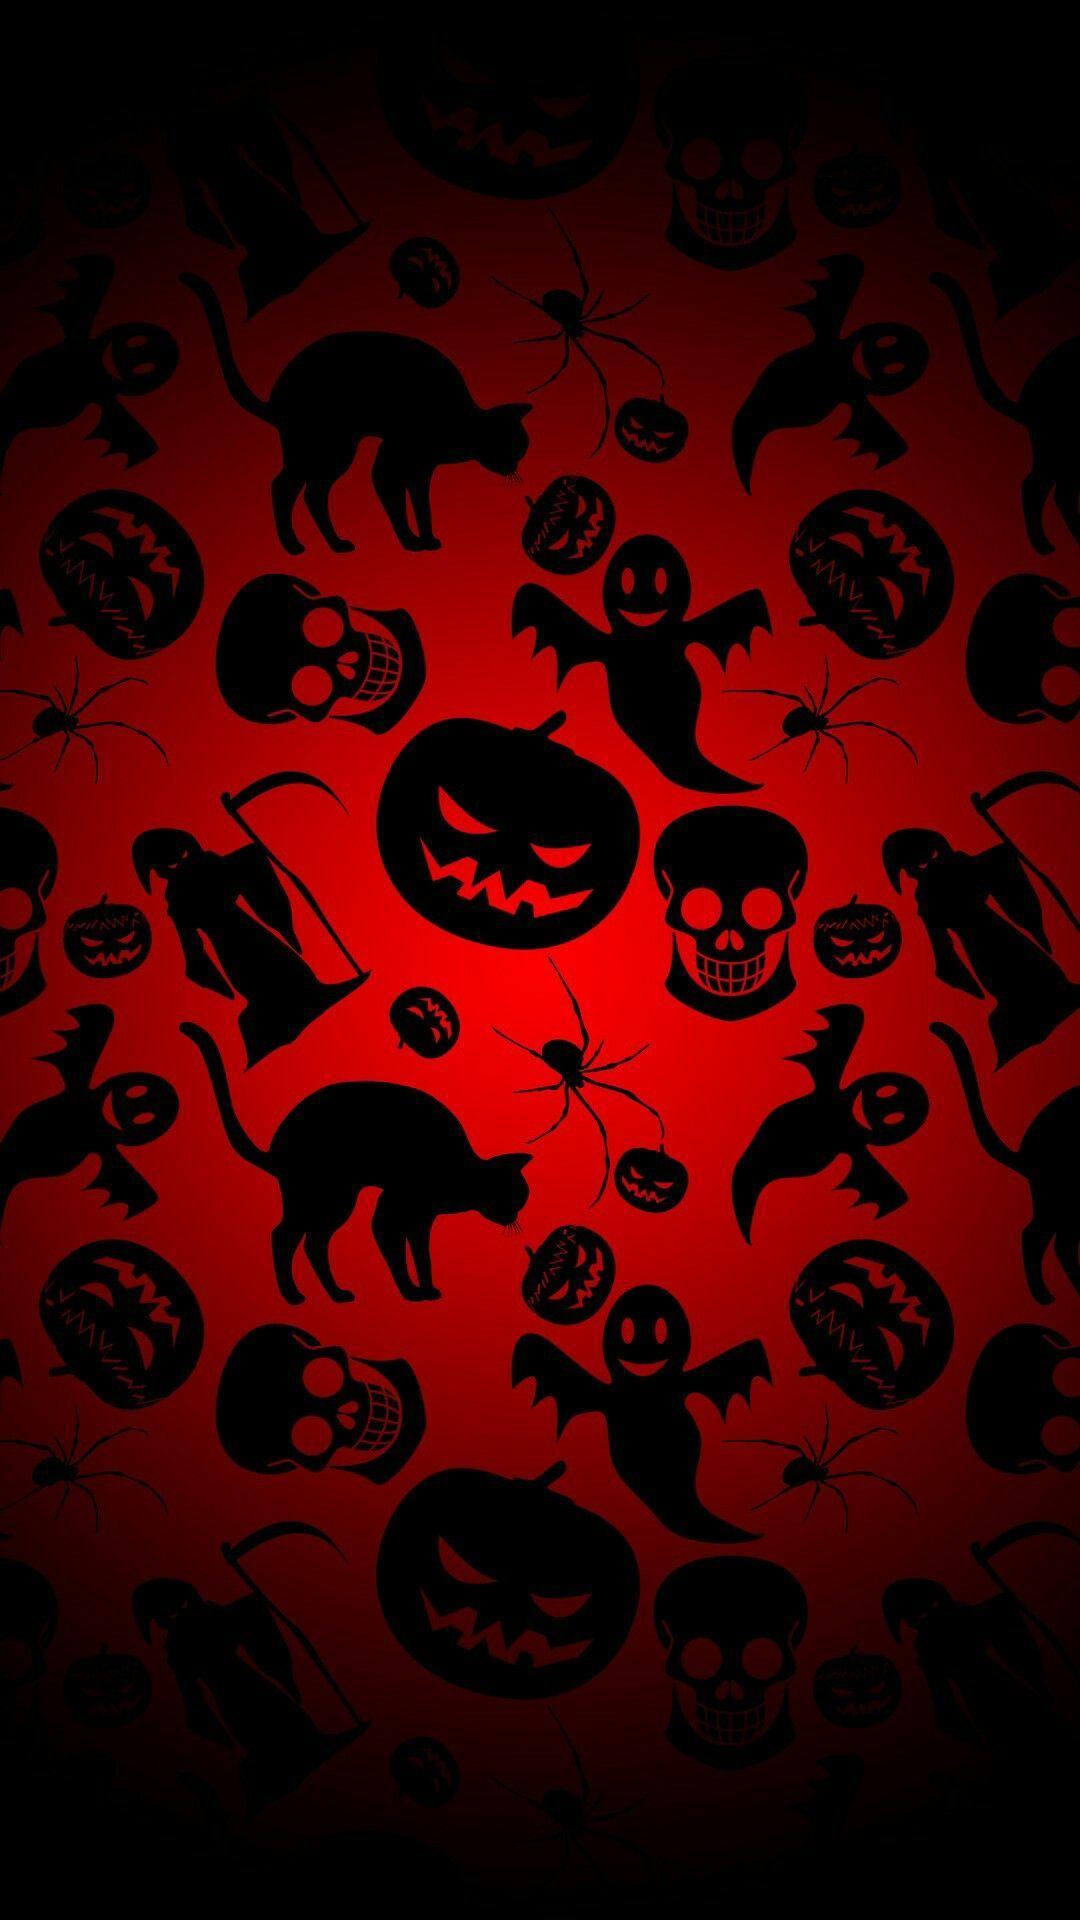 Halloween Iphone Wallpaper Hupages Download Iphone Wallpapers Halloween Wallpaper Halloween Wallpaper Iphone Dark Wallpaper